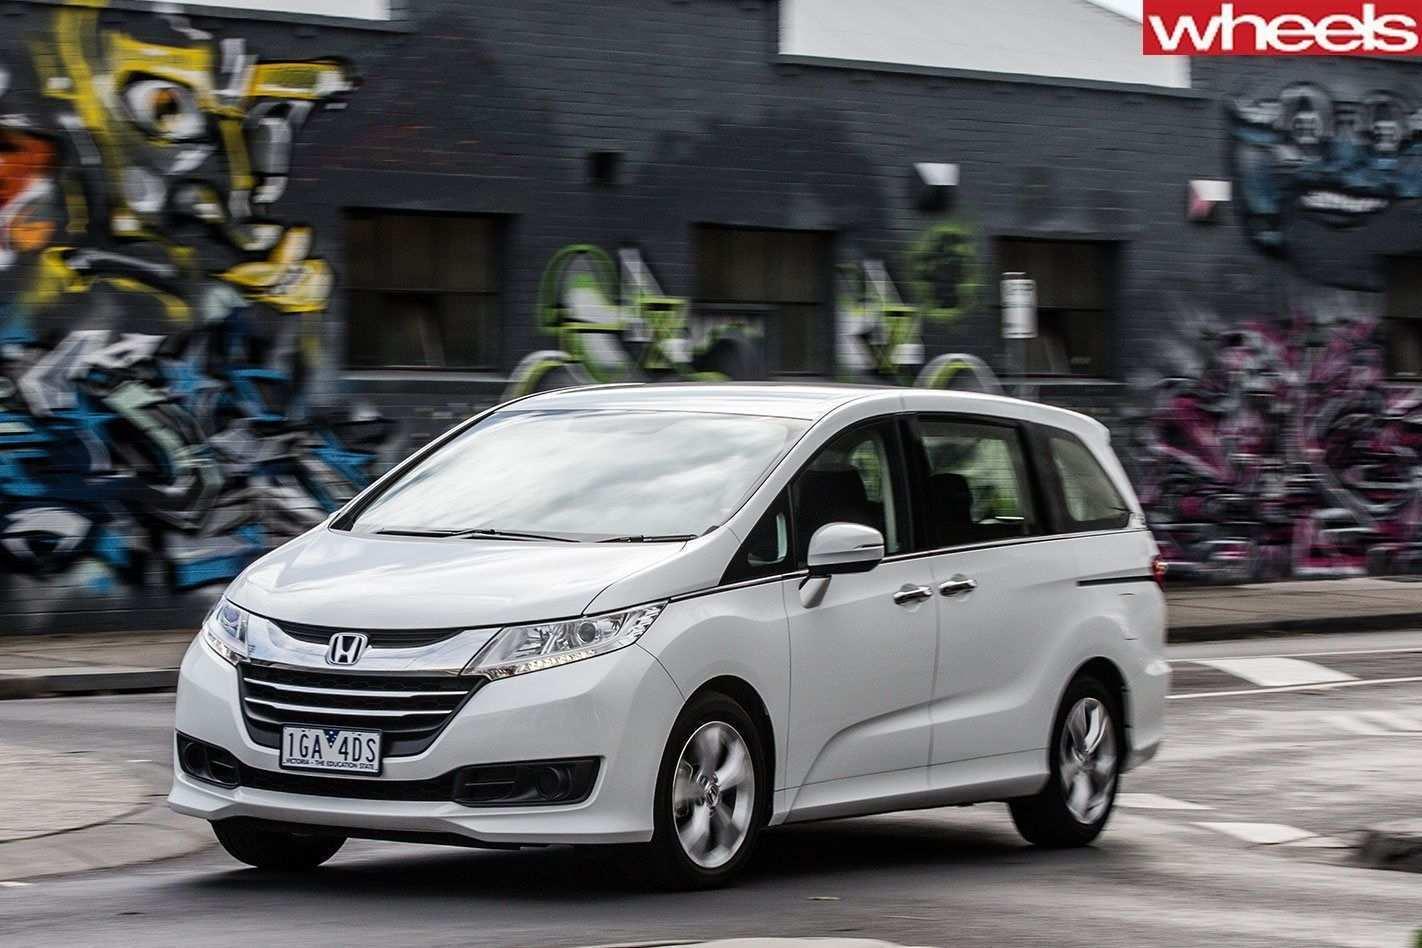 63 Best Review Honda Odyssey 2019 Australia Price by Honda Odyssey 2019 Australia